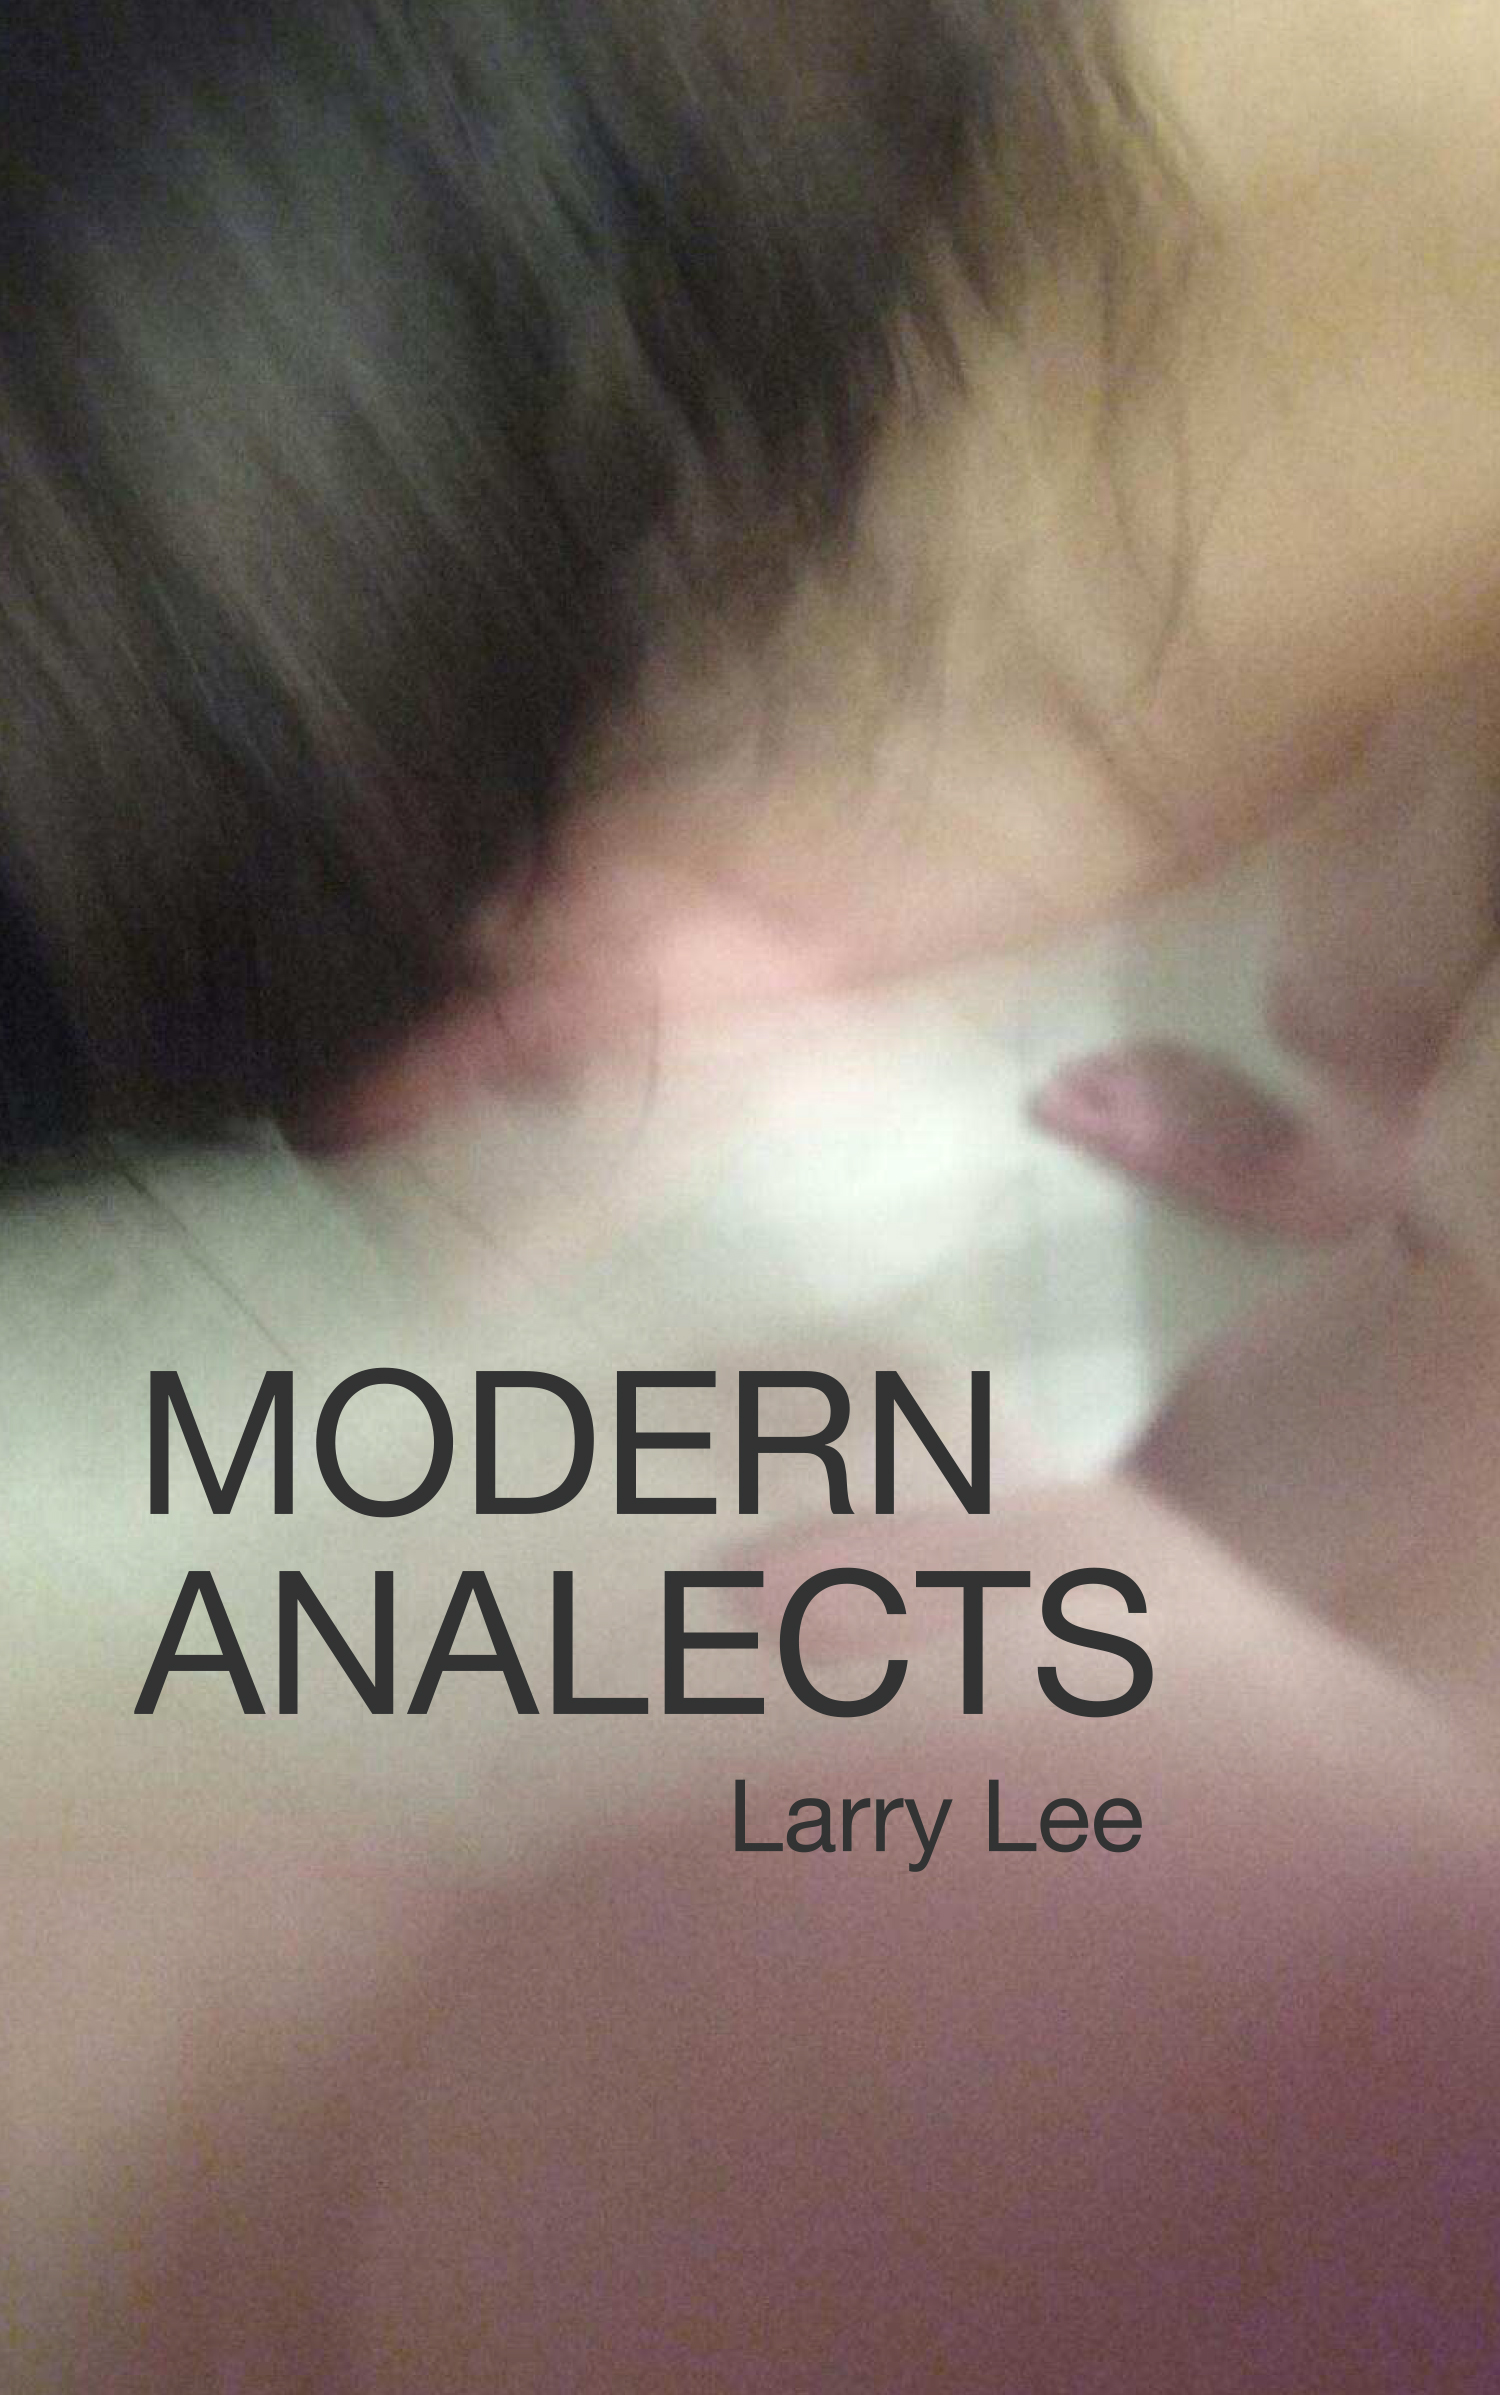 ModernAnalects.jpg